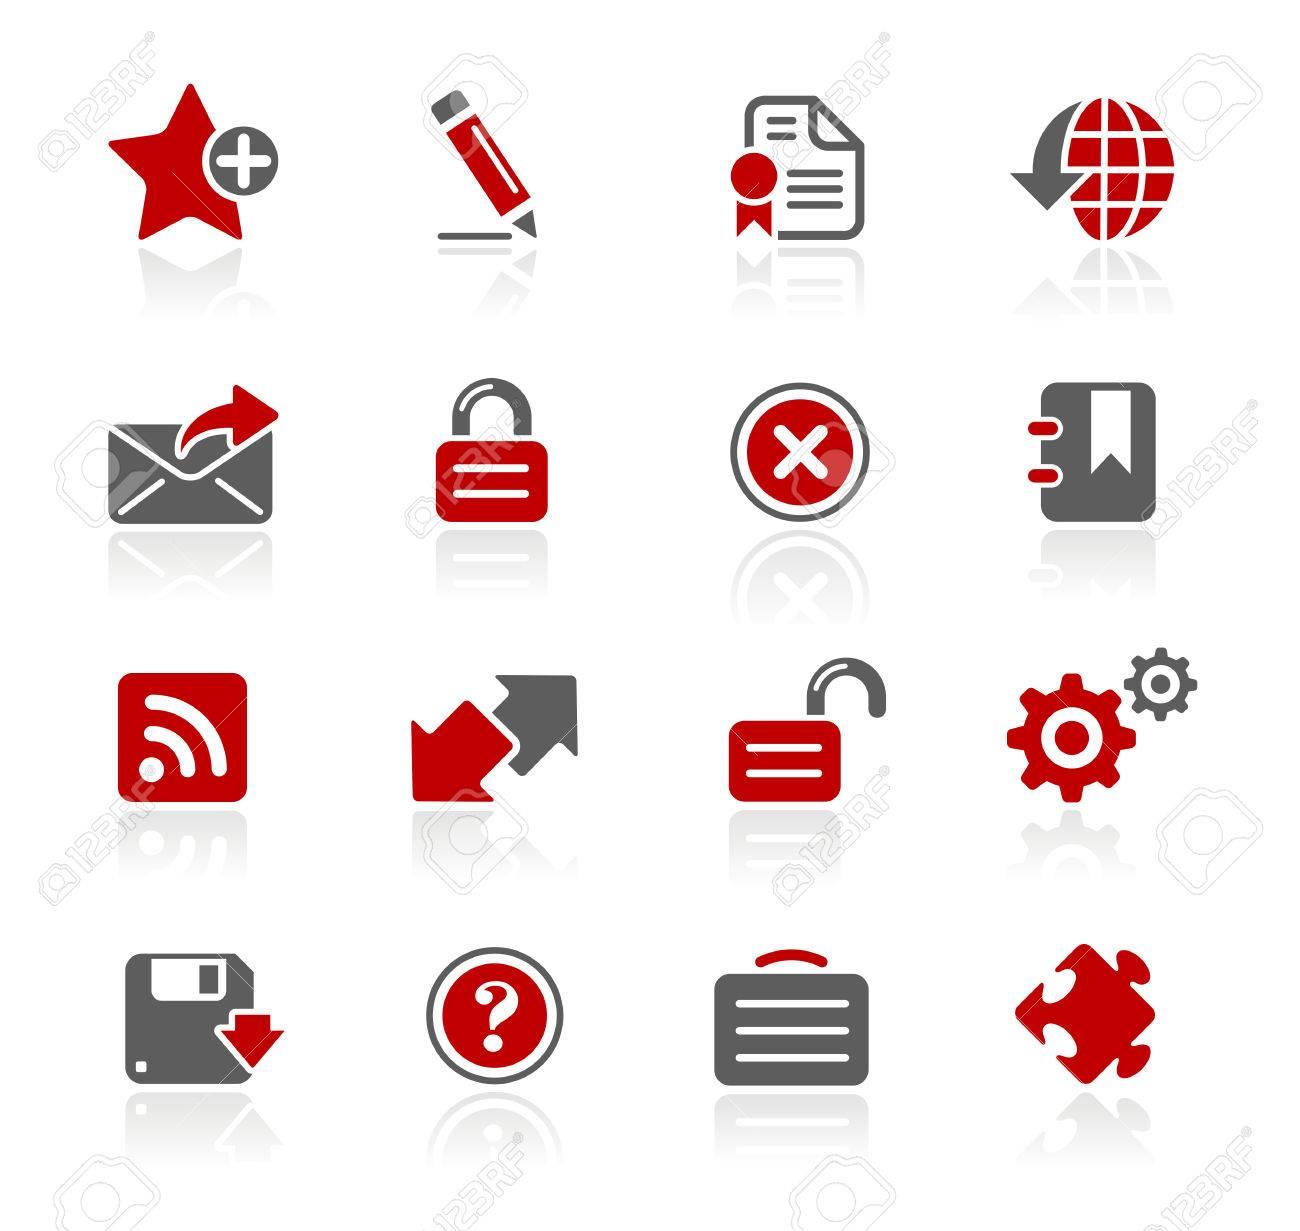 Web 20 icons redico series royalty free cliparts vectors and web 20 icons redico series stock vector 71628927 sciox Choice Image